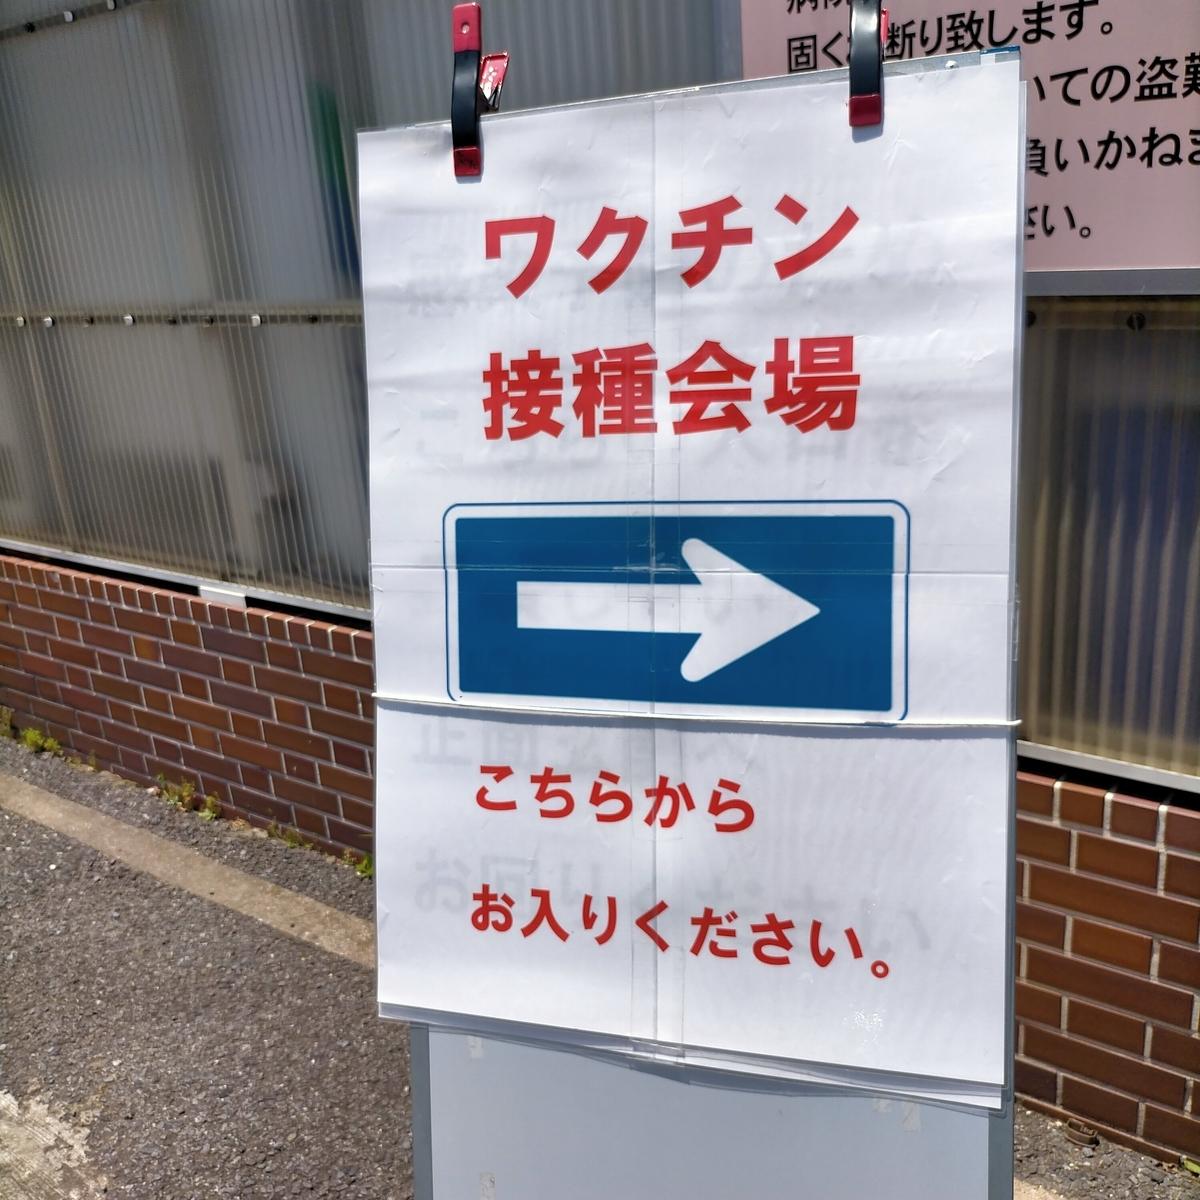 f:id:tsumagari2010:20210610065200j:plain